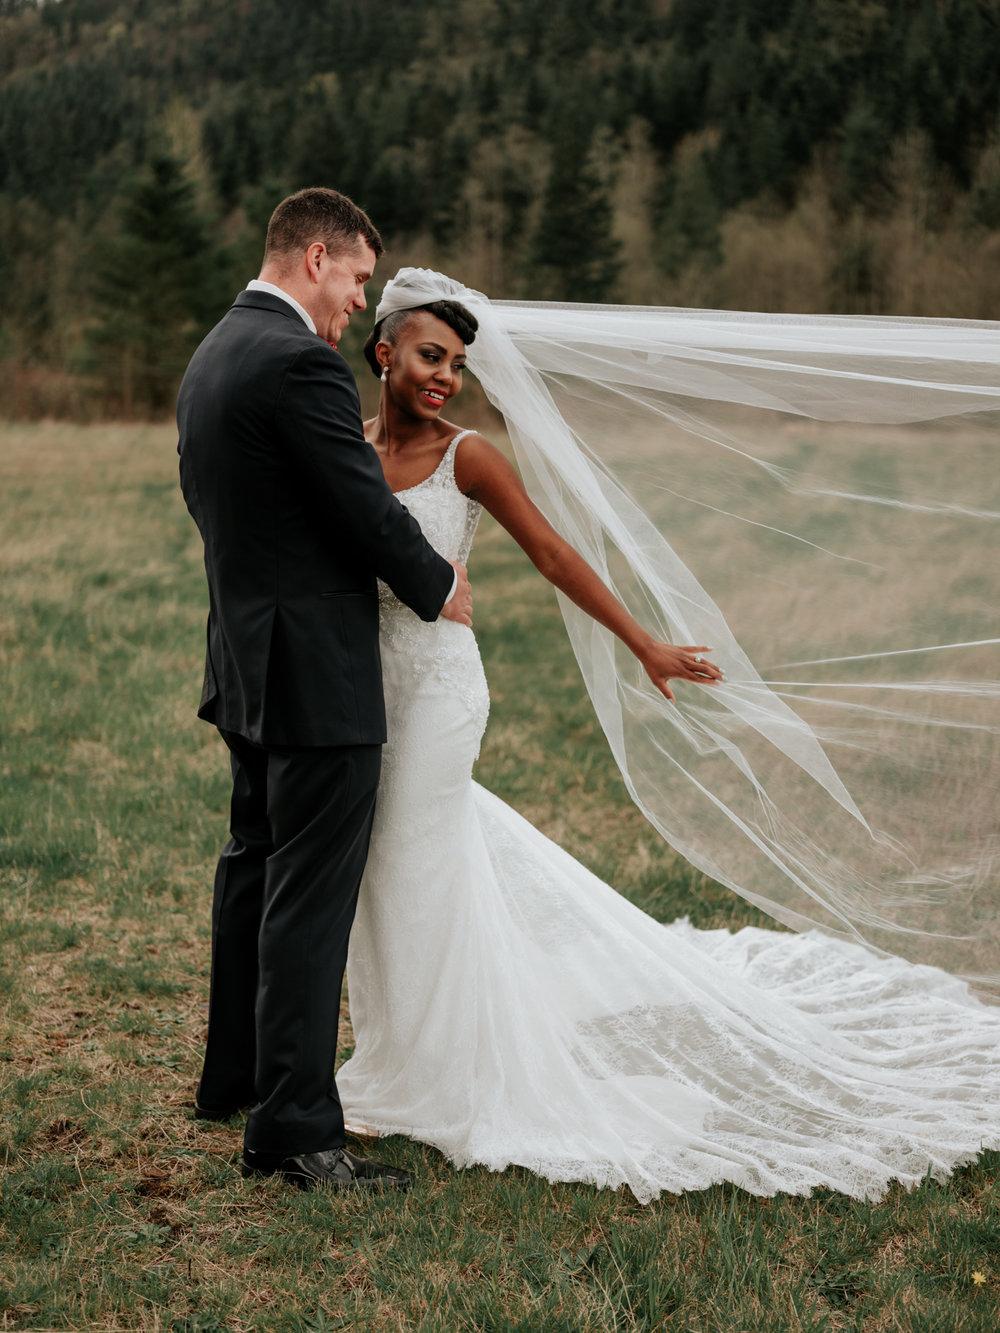 Stolen Glimpses Seattle Wedding Photographer at Rein Fire Ranch 29.jpg